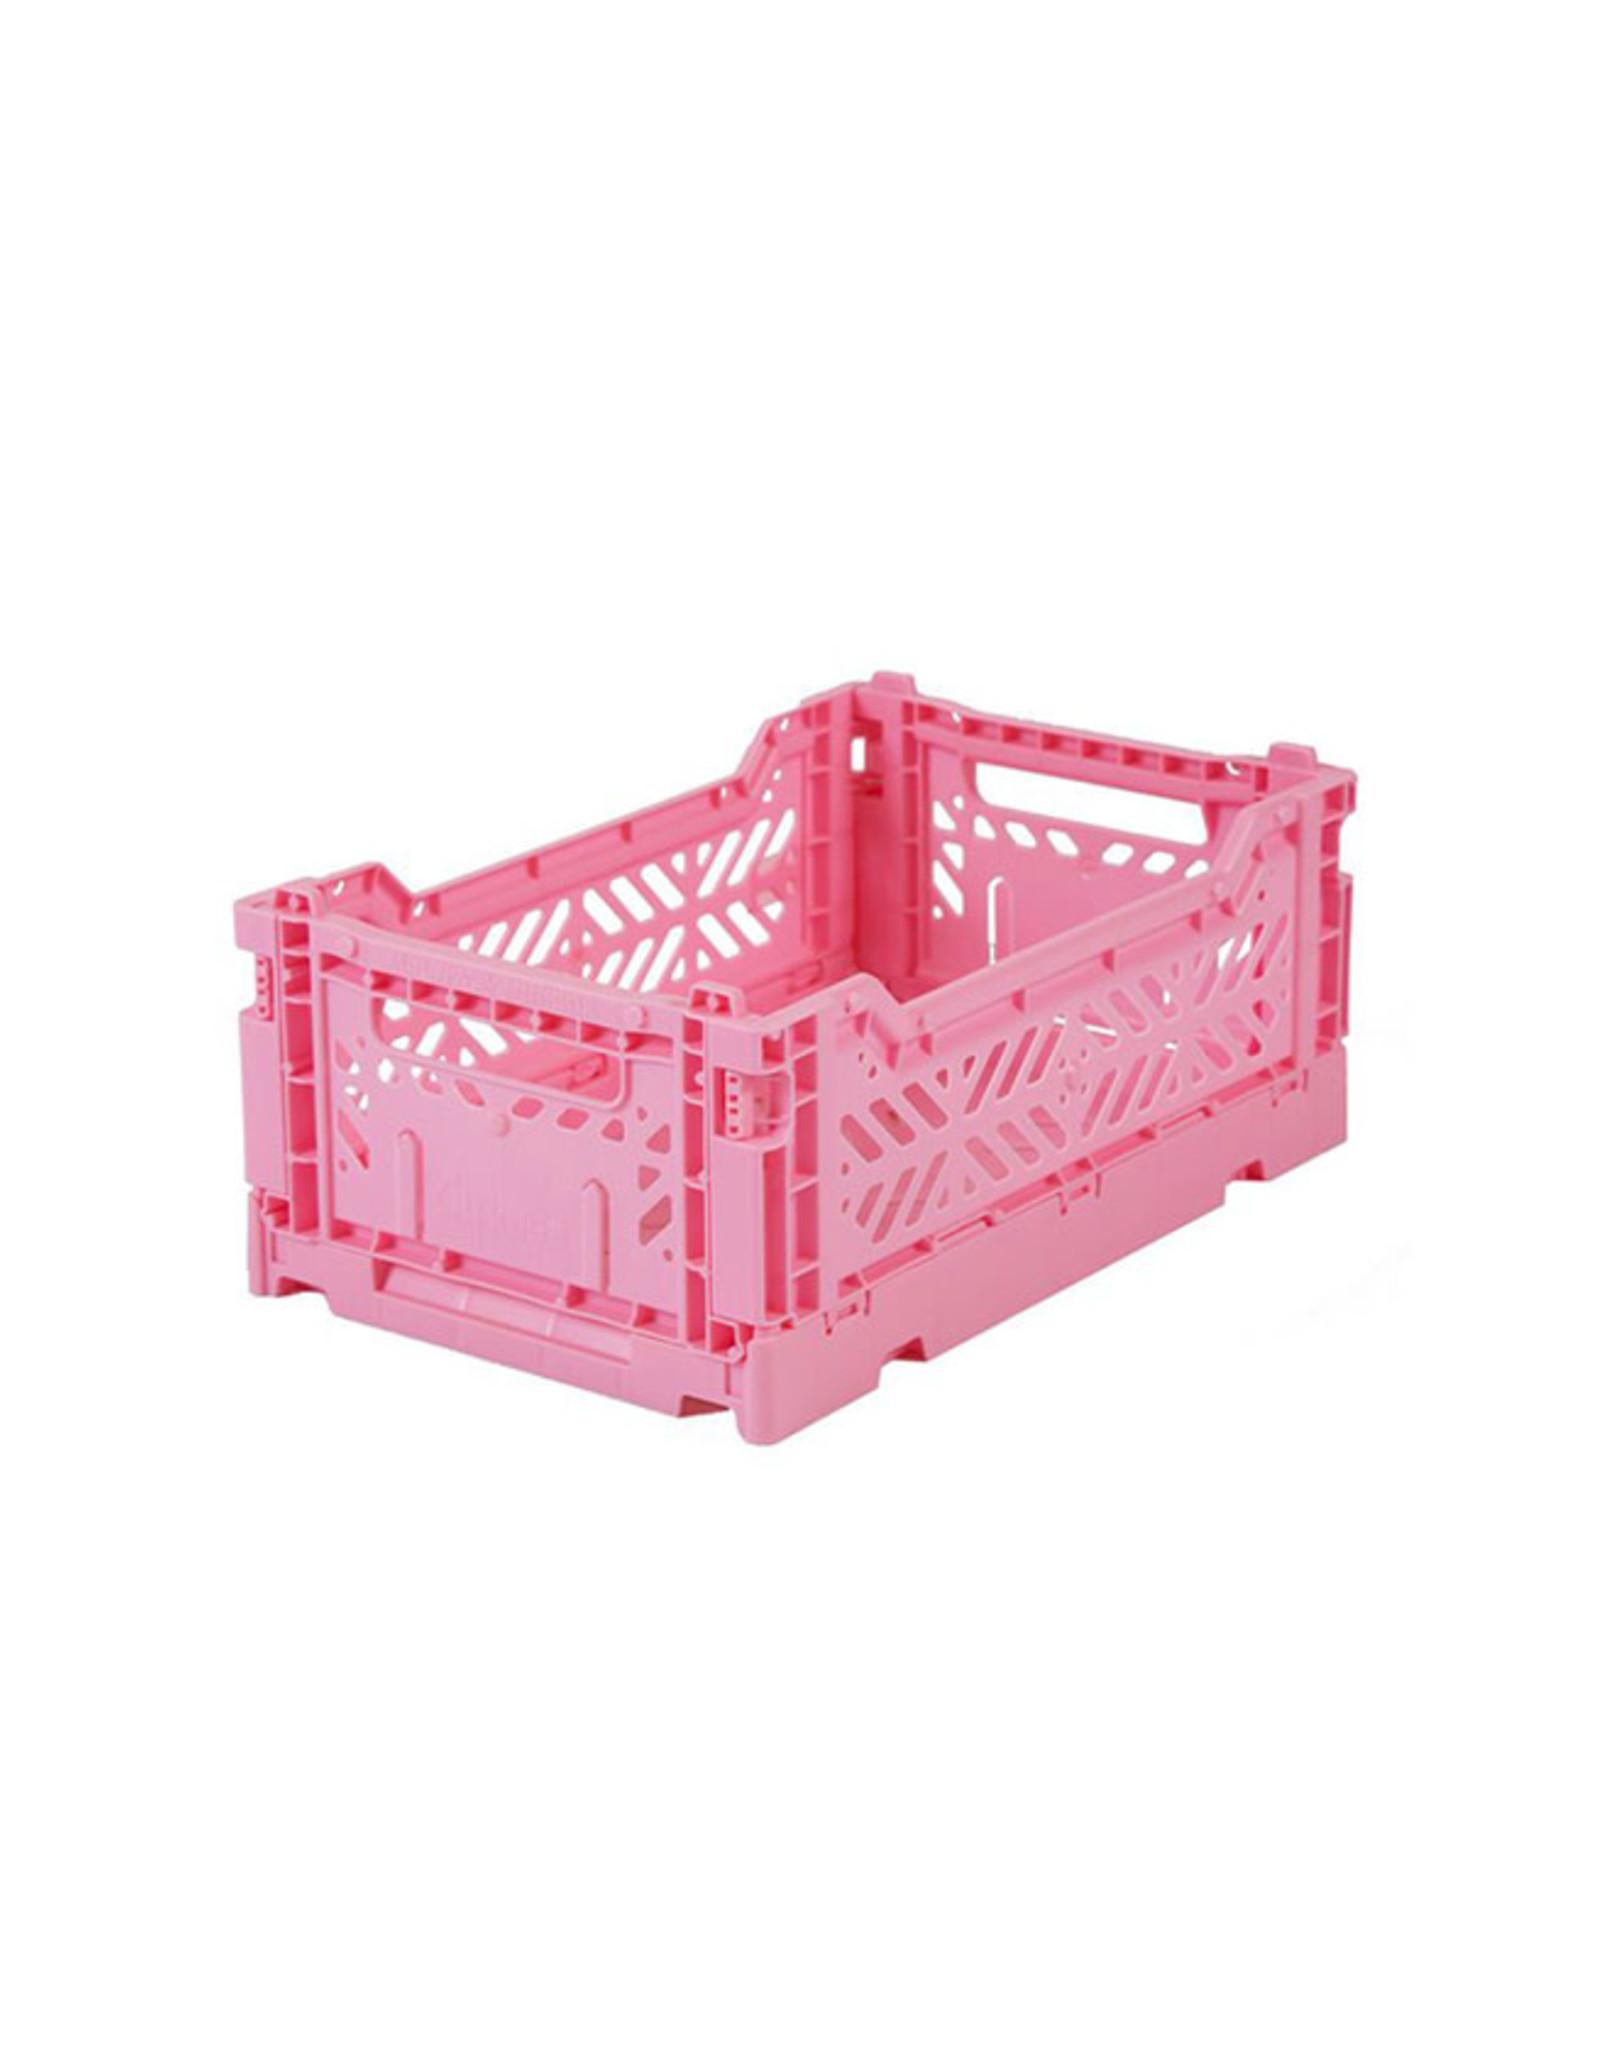 Aykasa Aykasa Plooibox Mini-baby pink